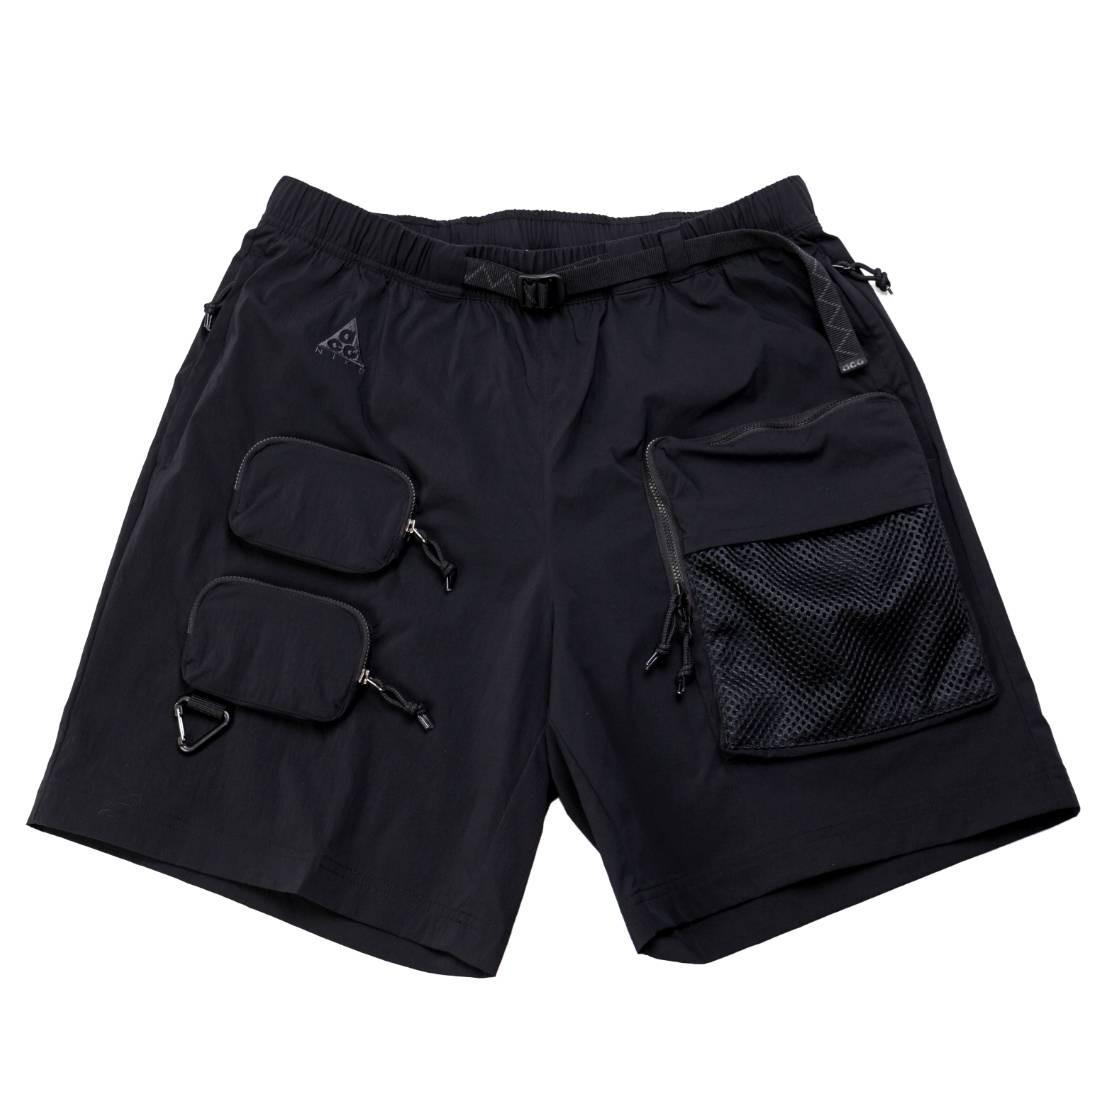 Nike Men Acg Cargo Shorts (black / black / anthracite)